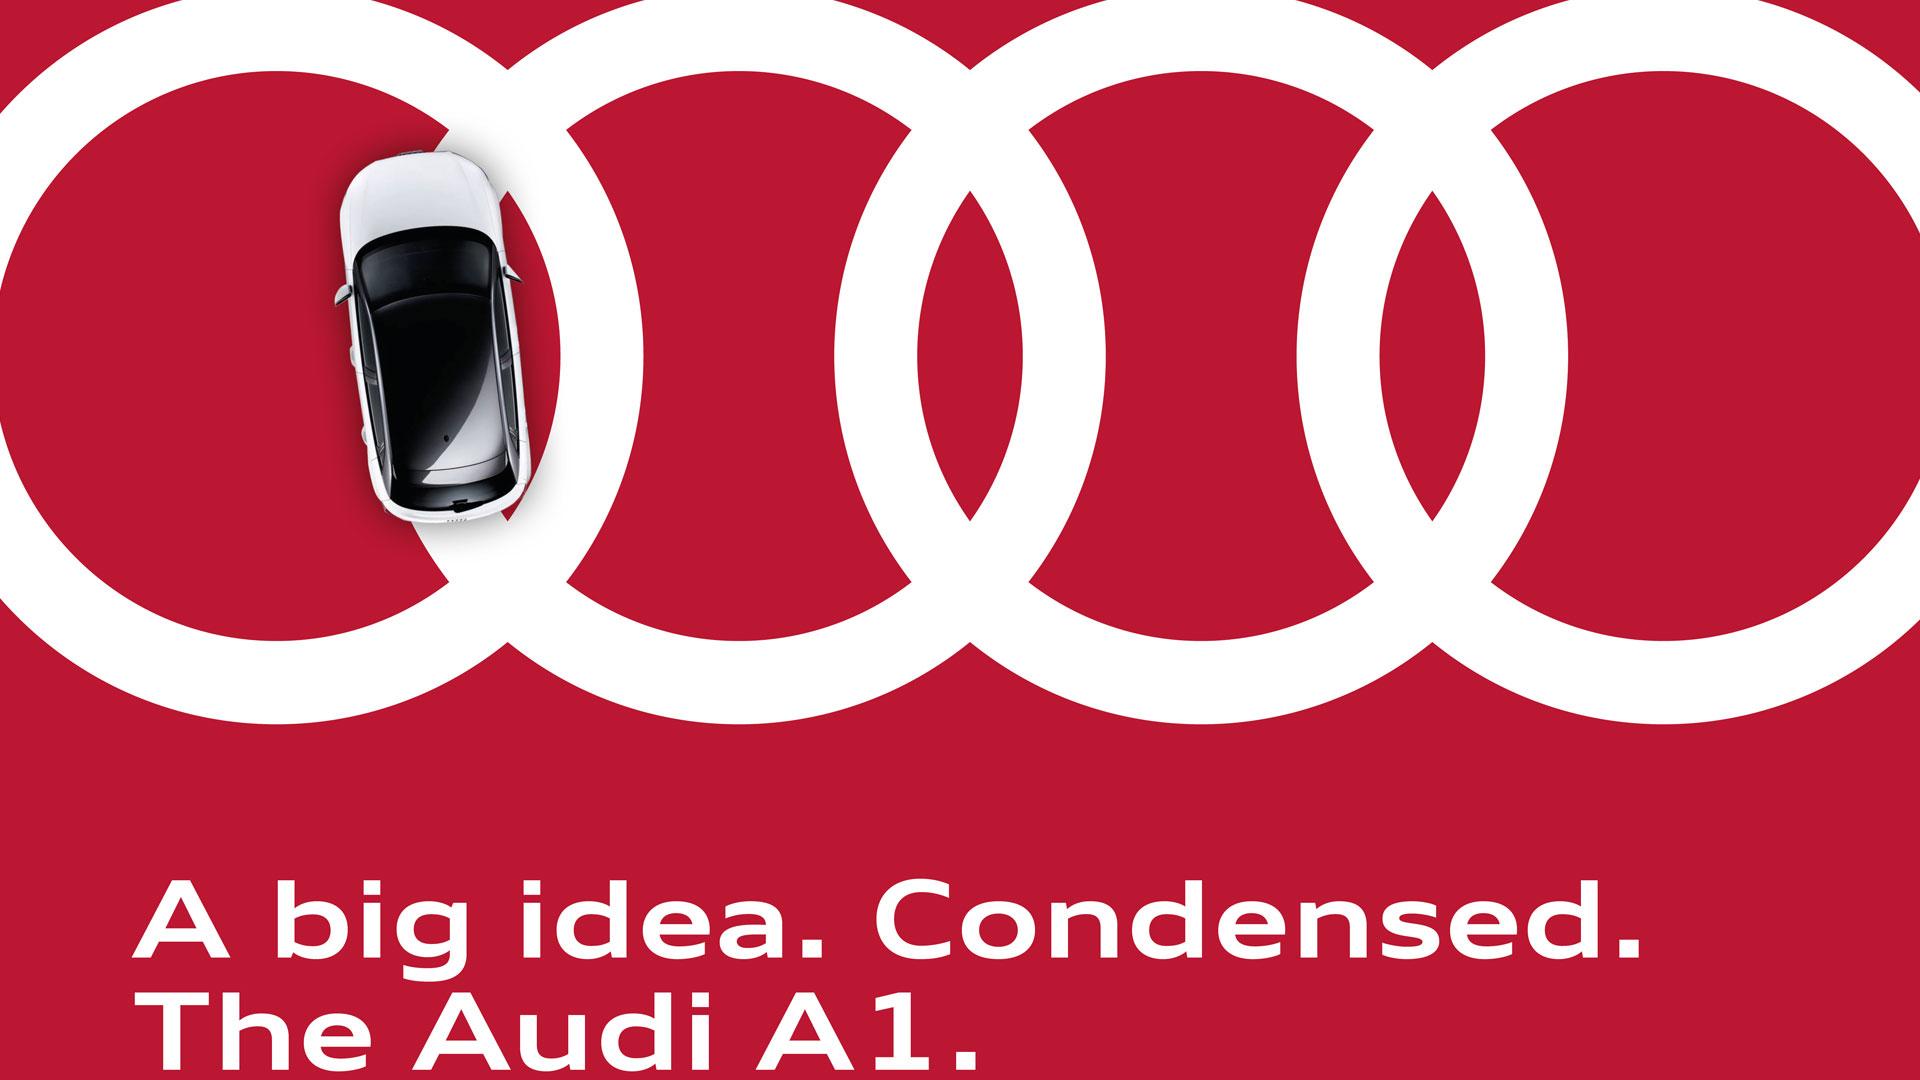 How Audi S Digital First Identity Looks To Make Branding